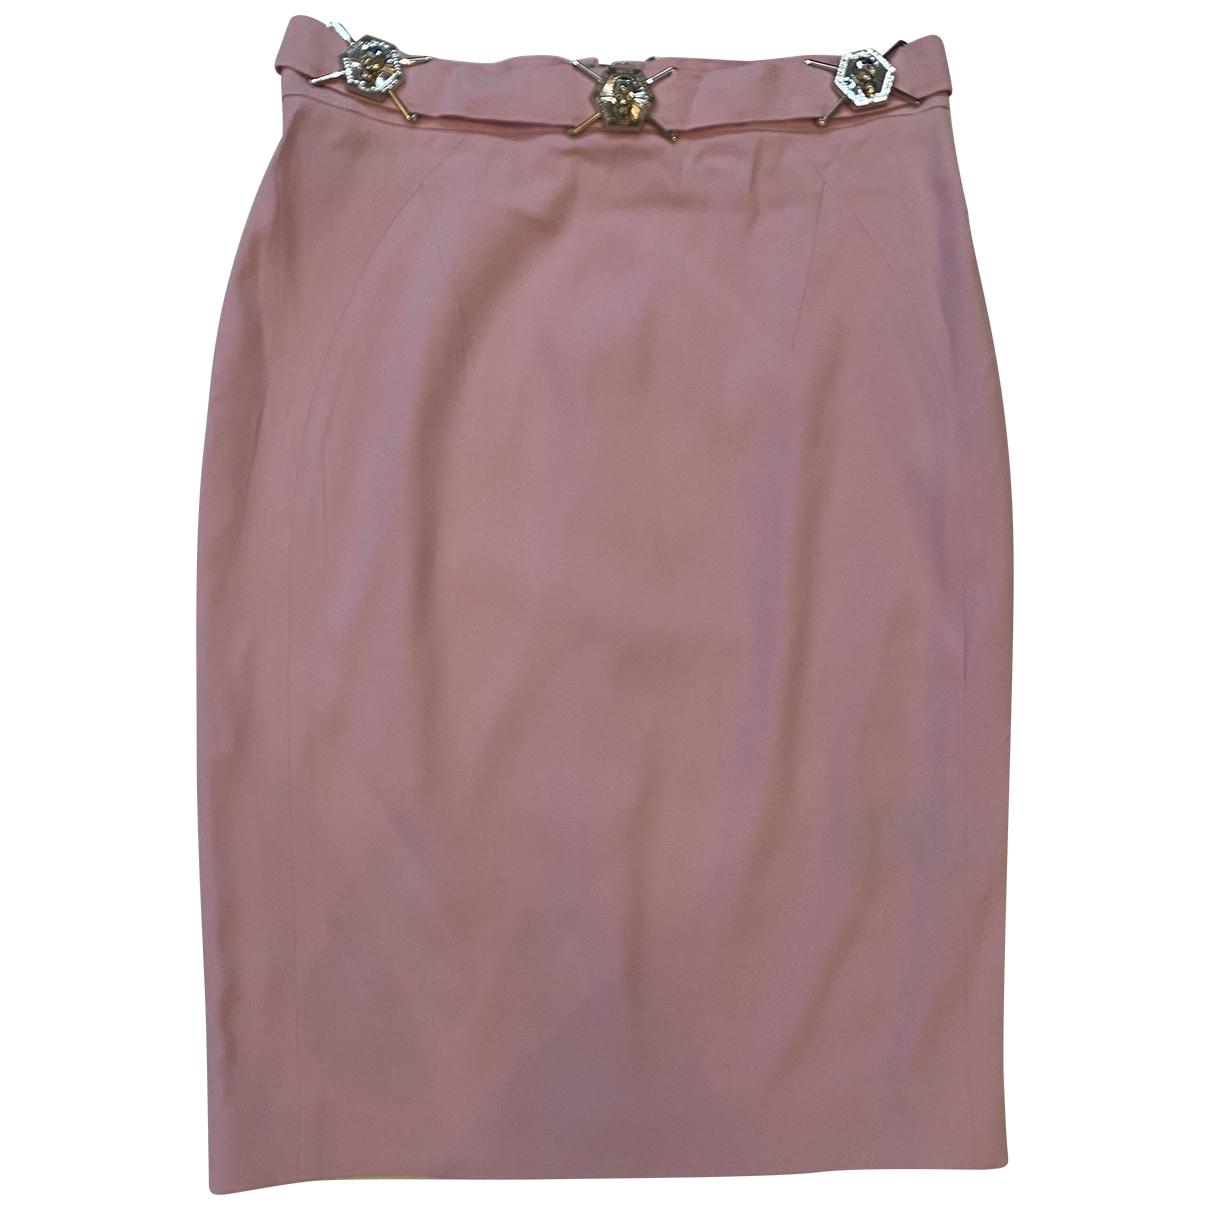 Philipp Plein \N Pink skirt for Women M International